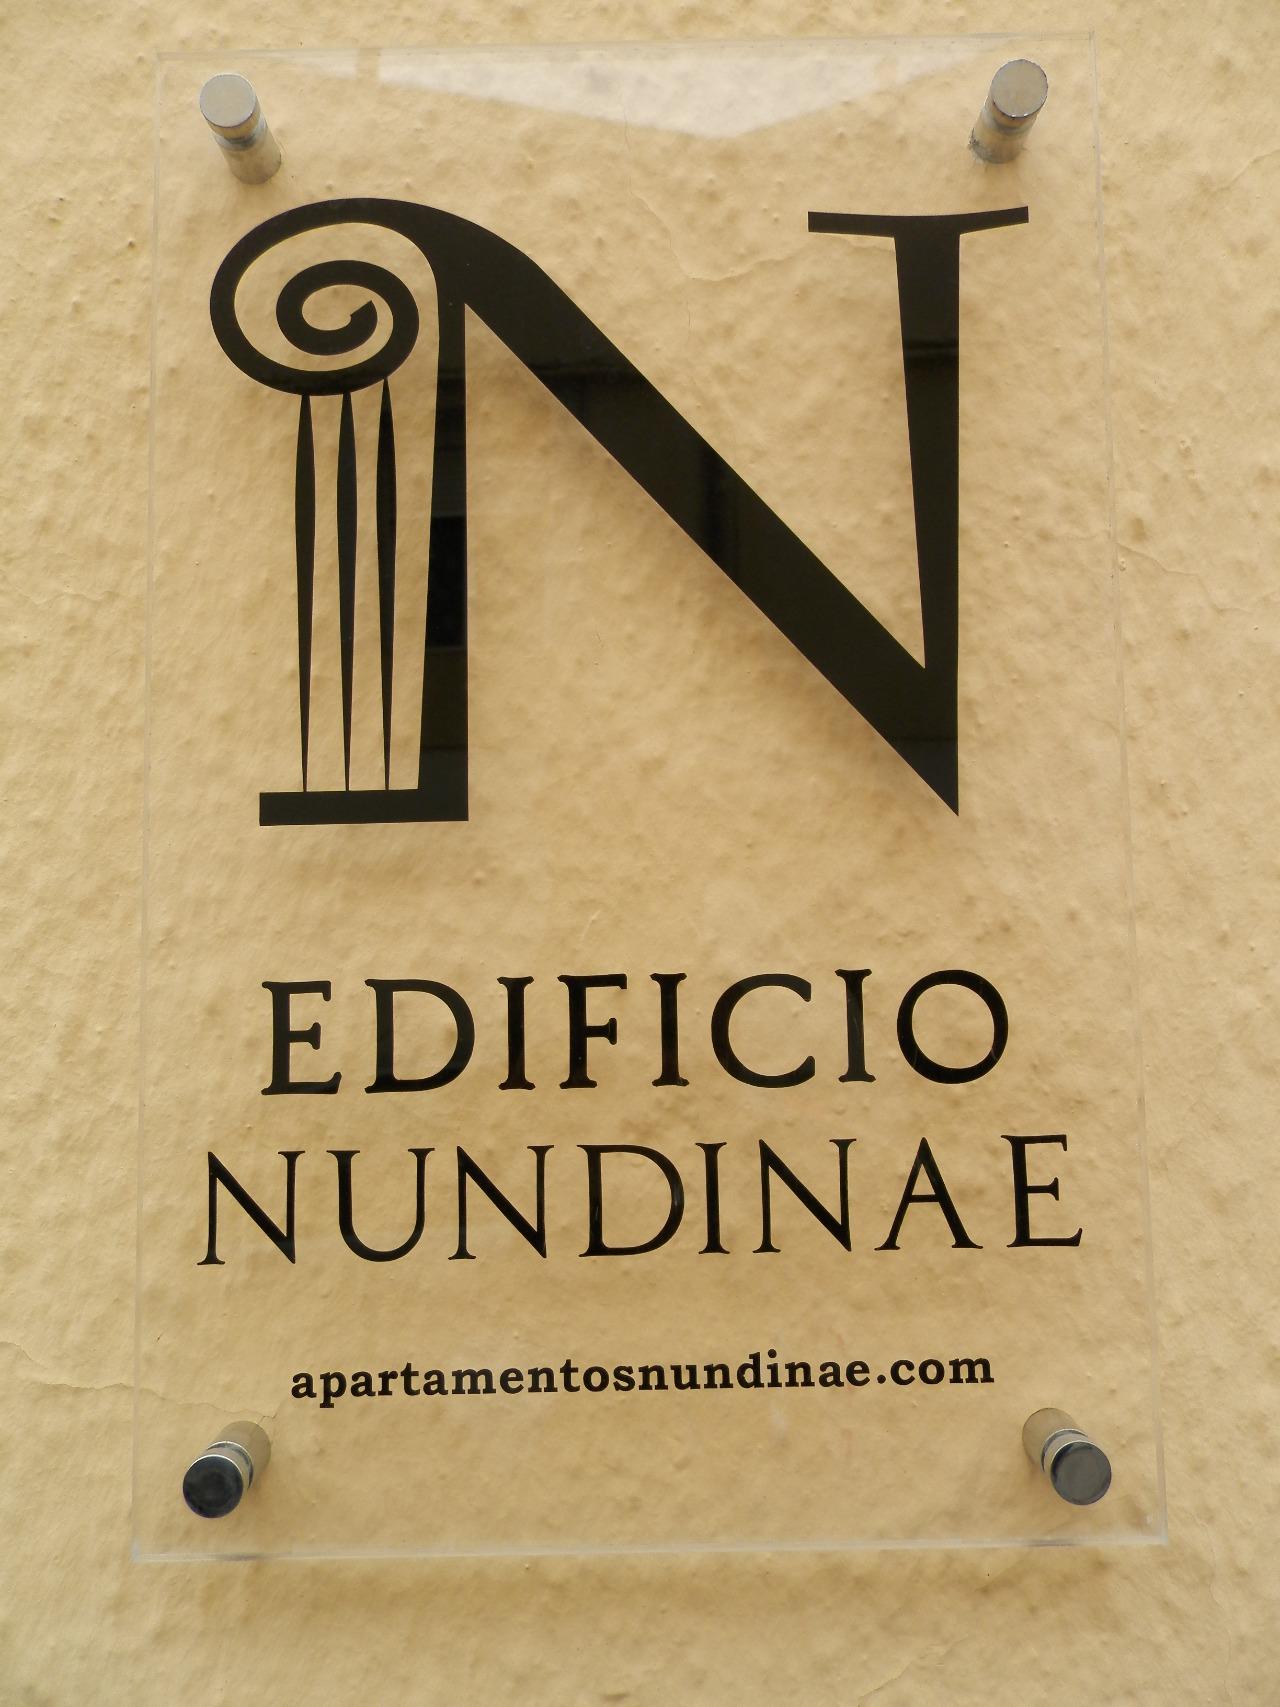 placa identificativa edificio nundinae